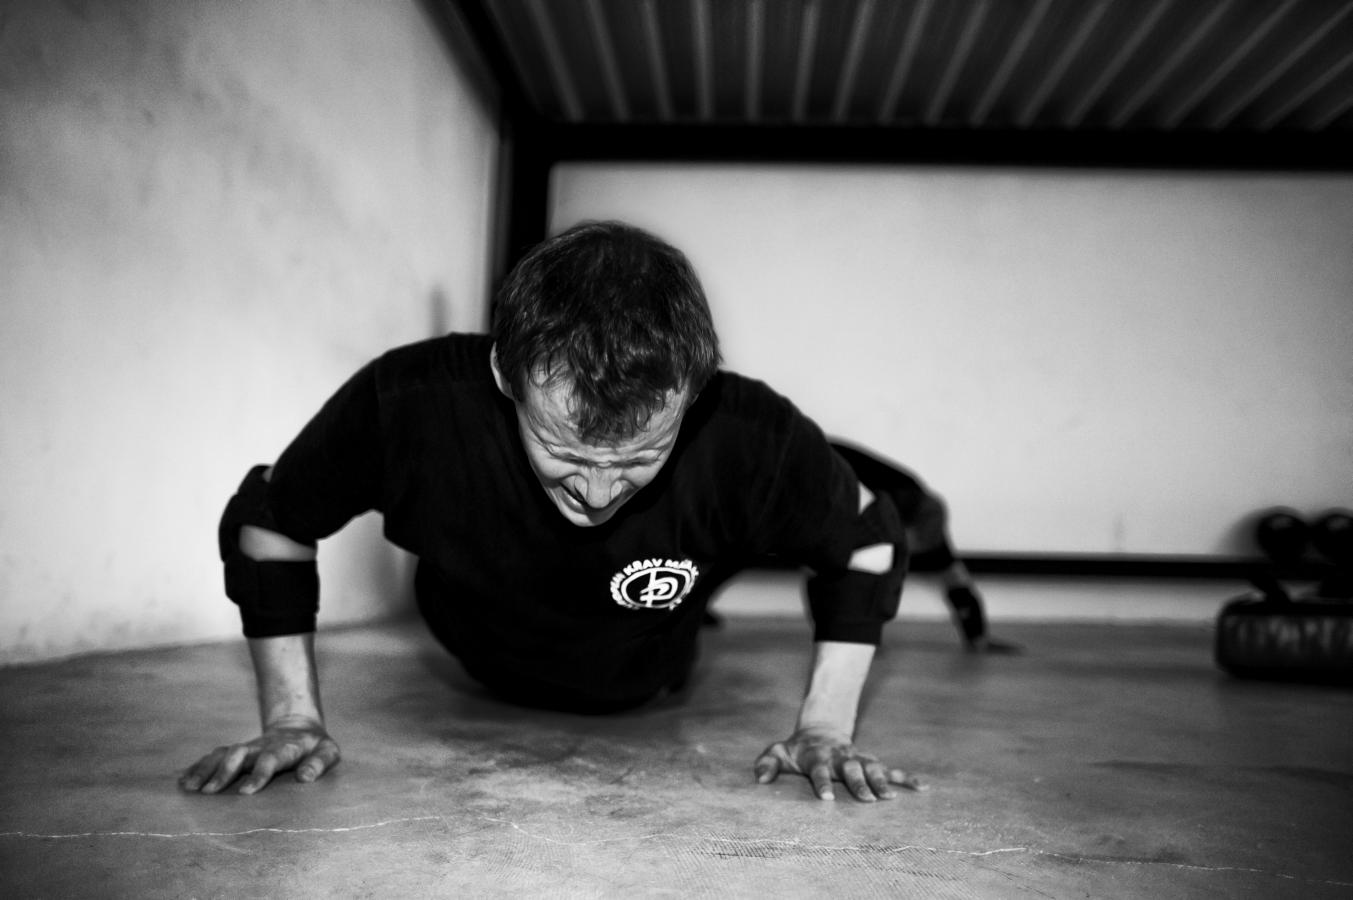 wim-krav-maga-training-antwerpen-2012